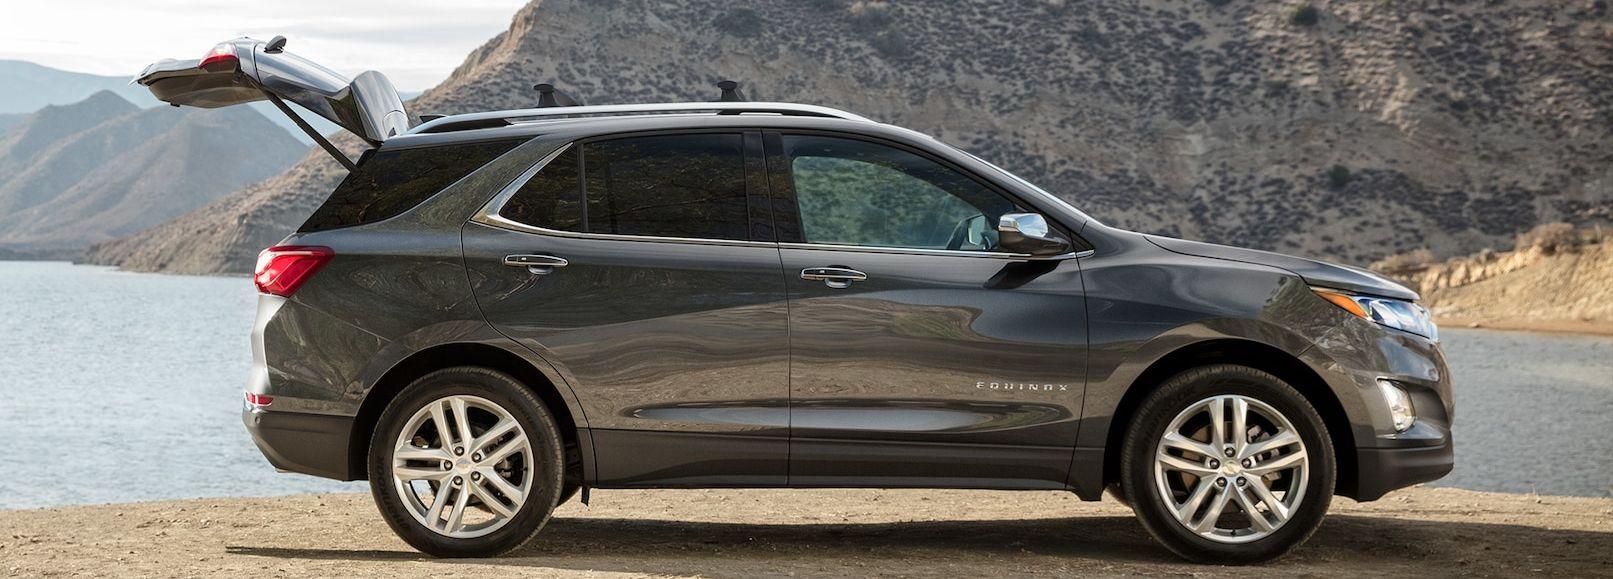 2019 Chevrolet Equinox for Sale near St. Johns, MI